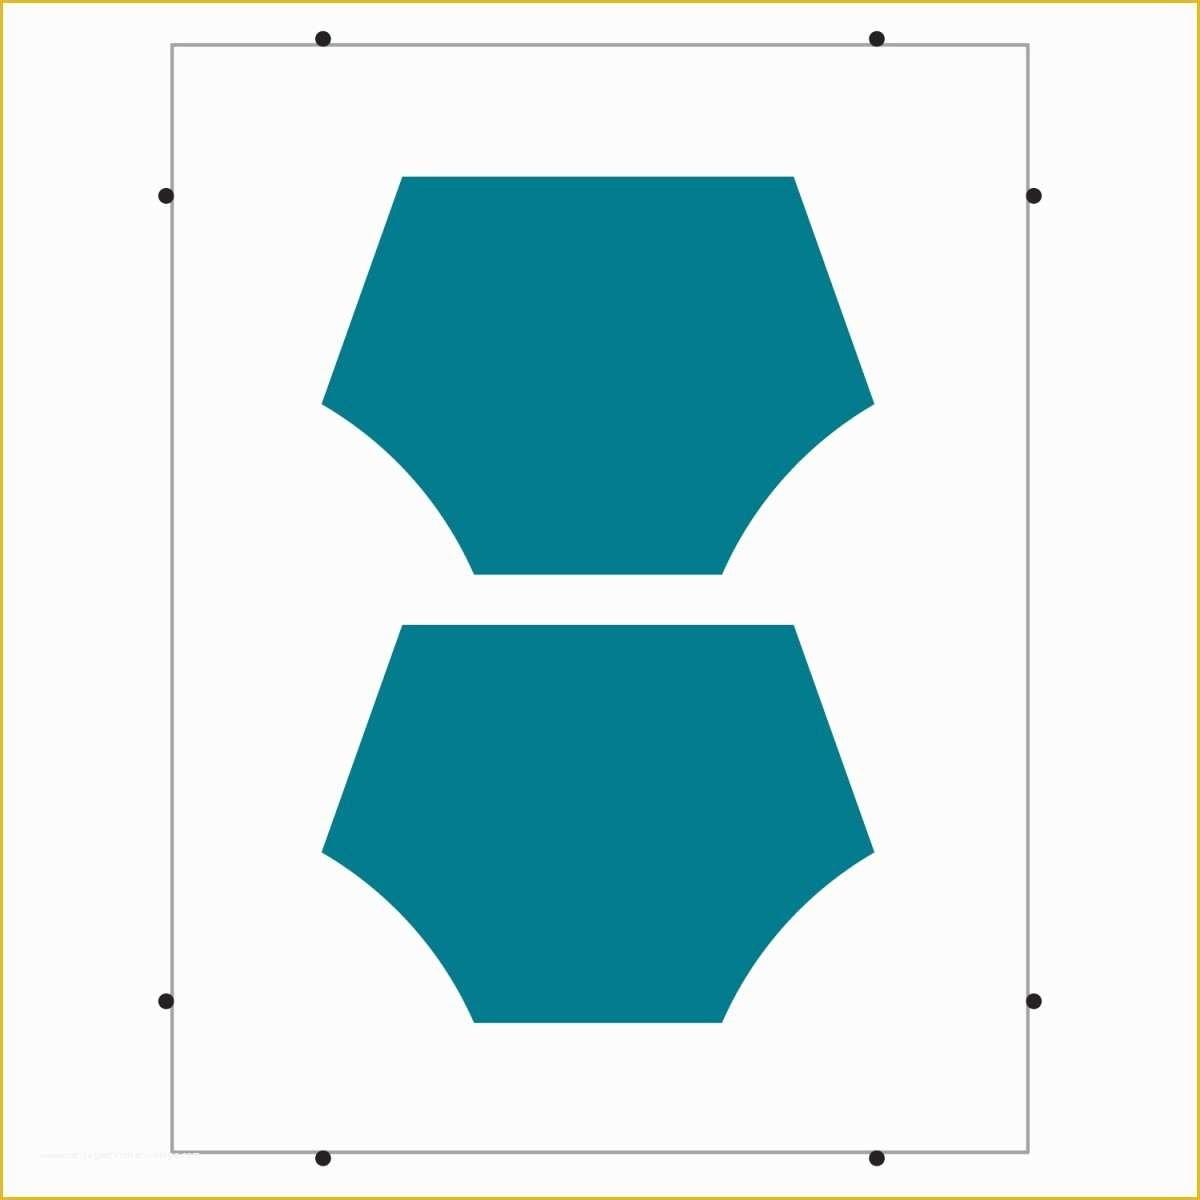 Free Printable Diaper Invitation Template Of 25 Best Ideas About - Free Printable Diaper Invitation Template